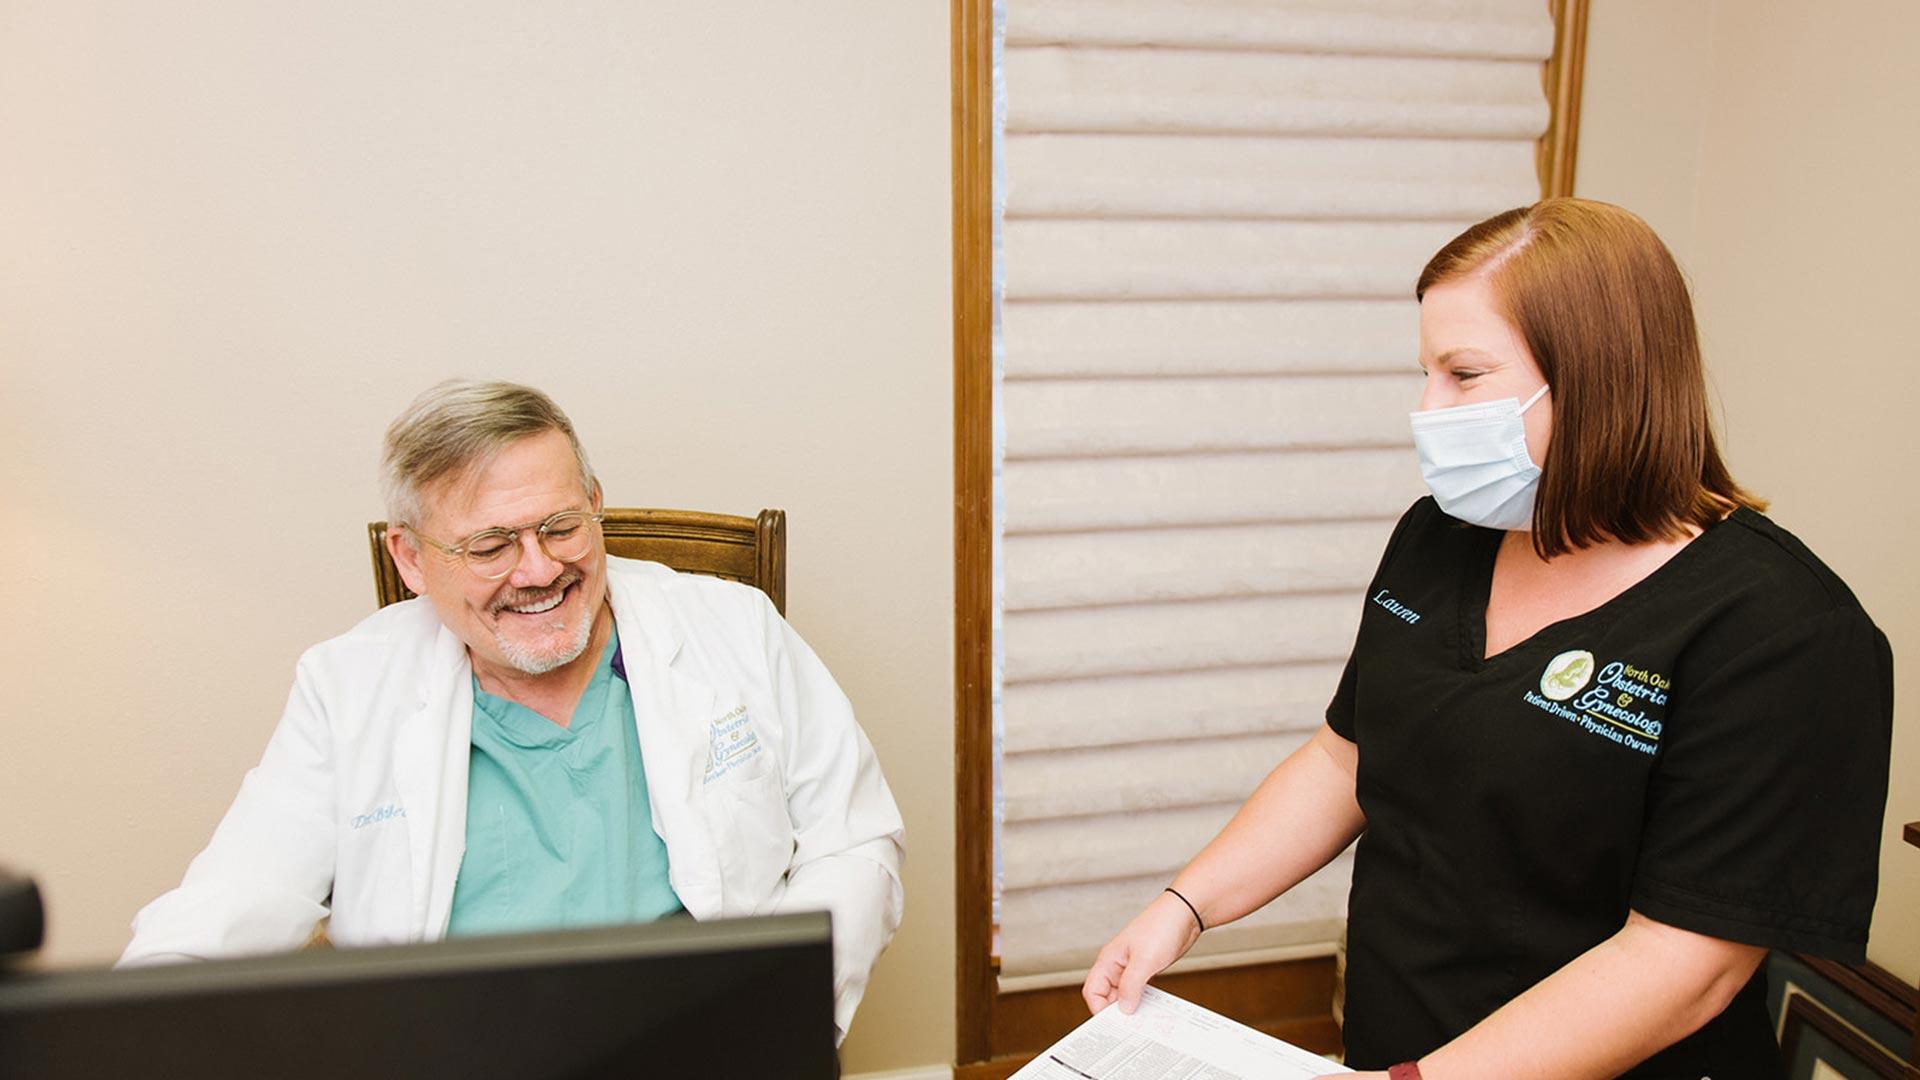 Dr. Beacham and nurse Lauren at North Oaks OBGYN.